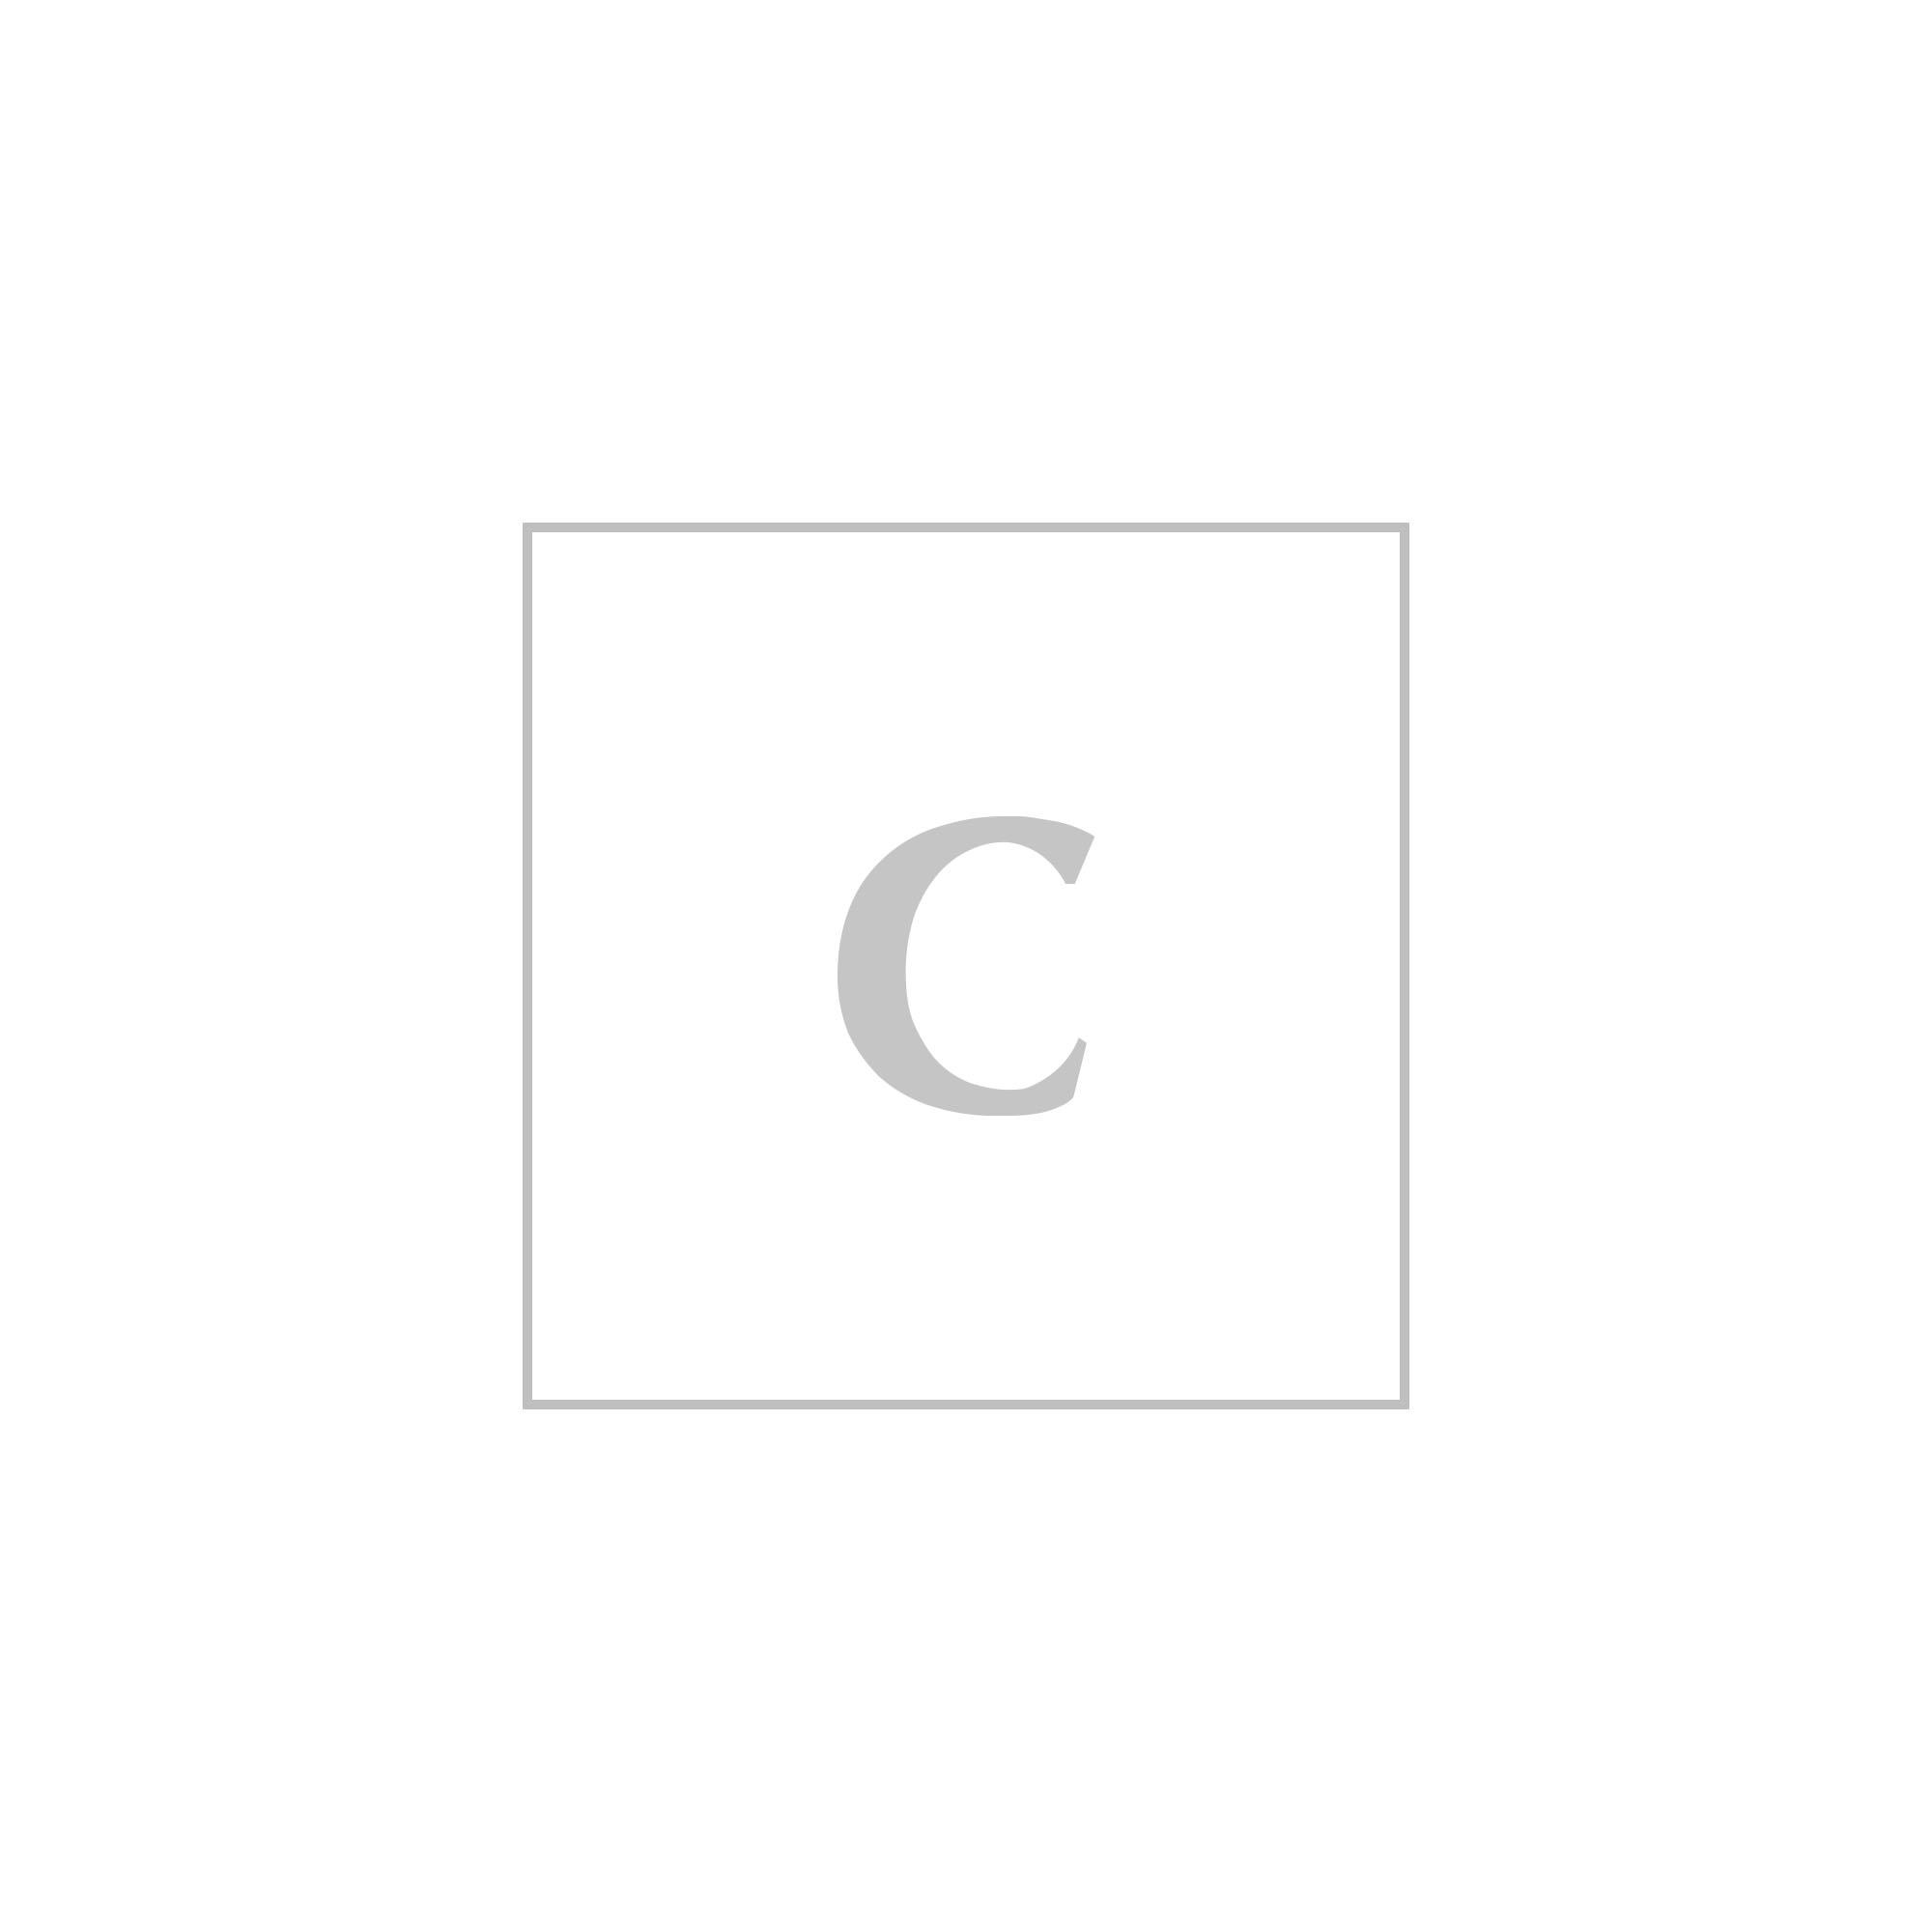 Michael kors borsa cindy small crossbody